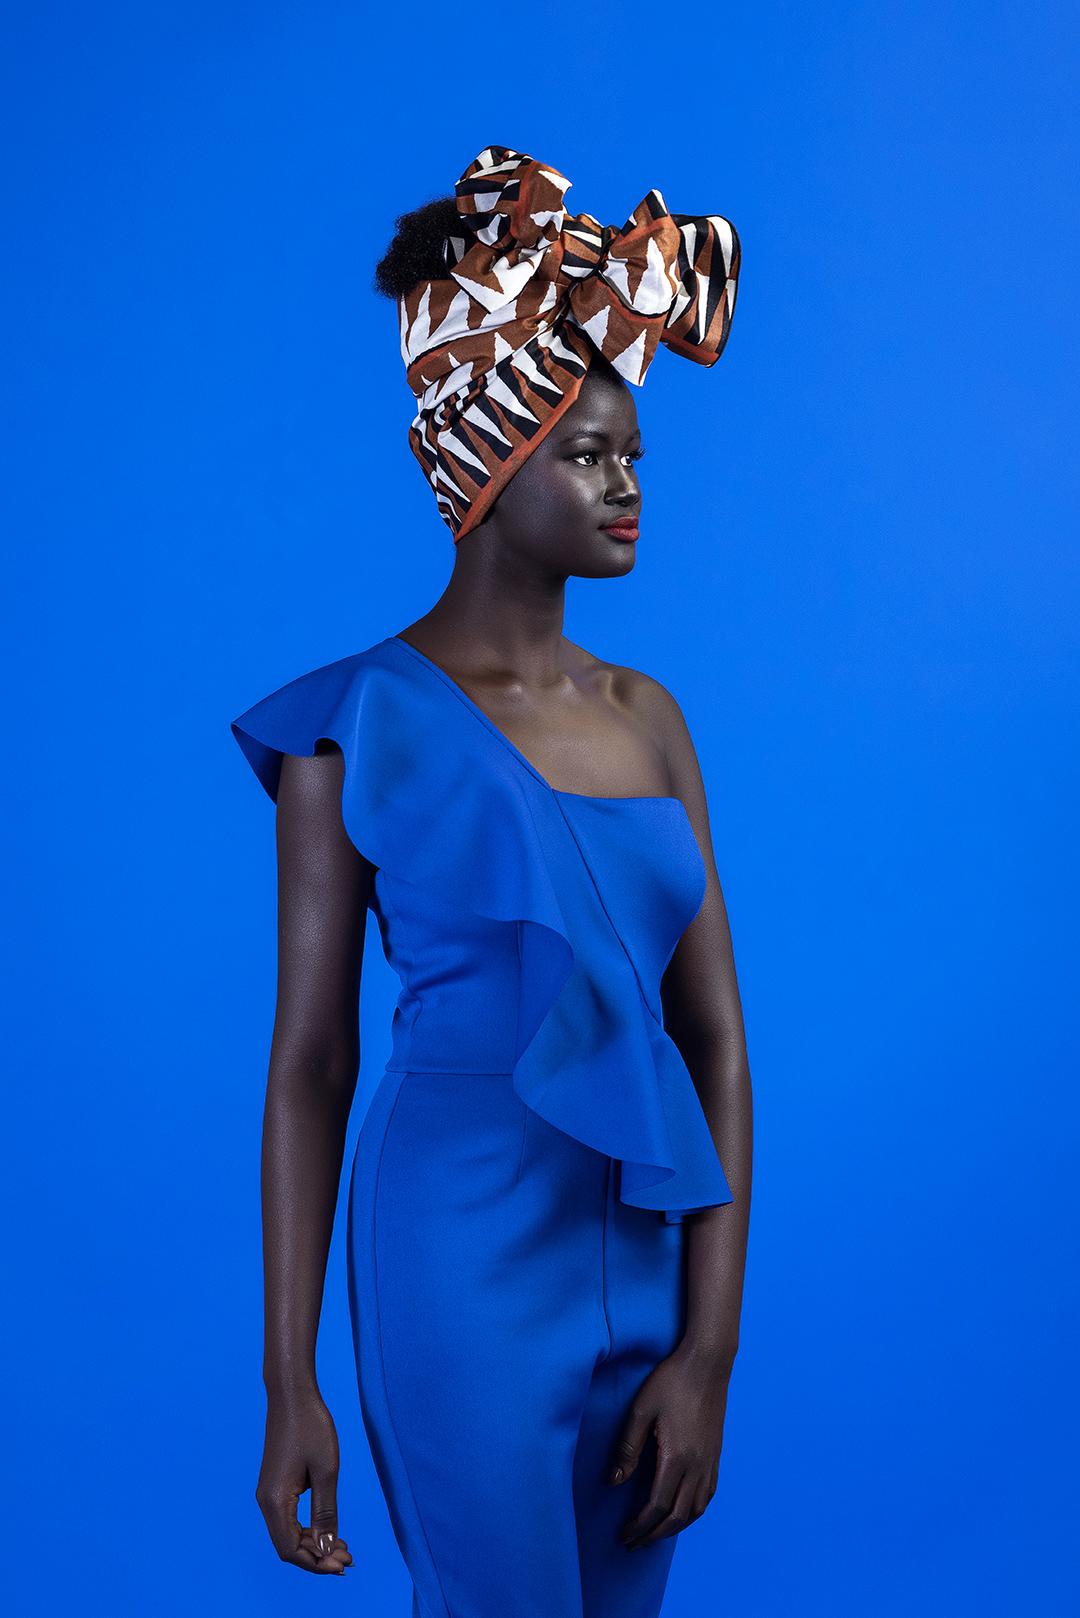 mirza-babic-fashion-photography-new-york-ny-nikon-high-fashion-product24.jpg